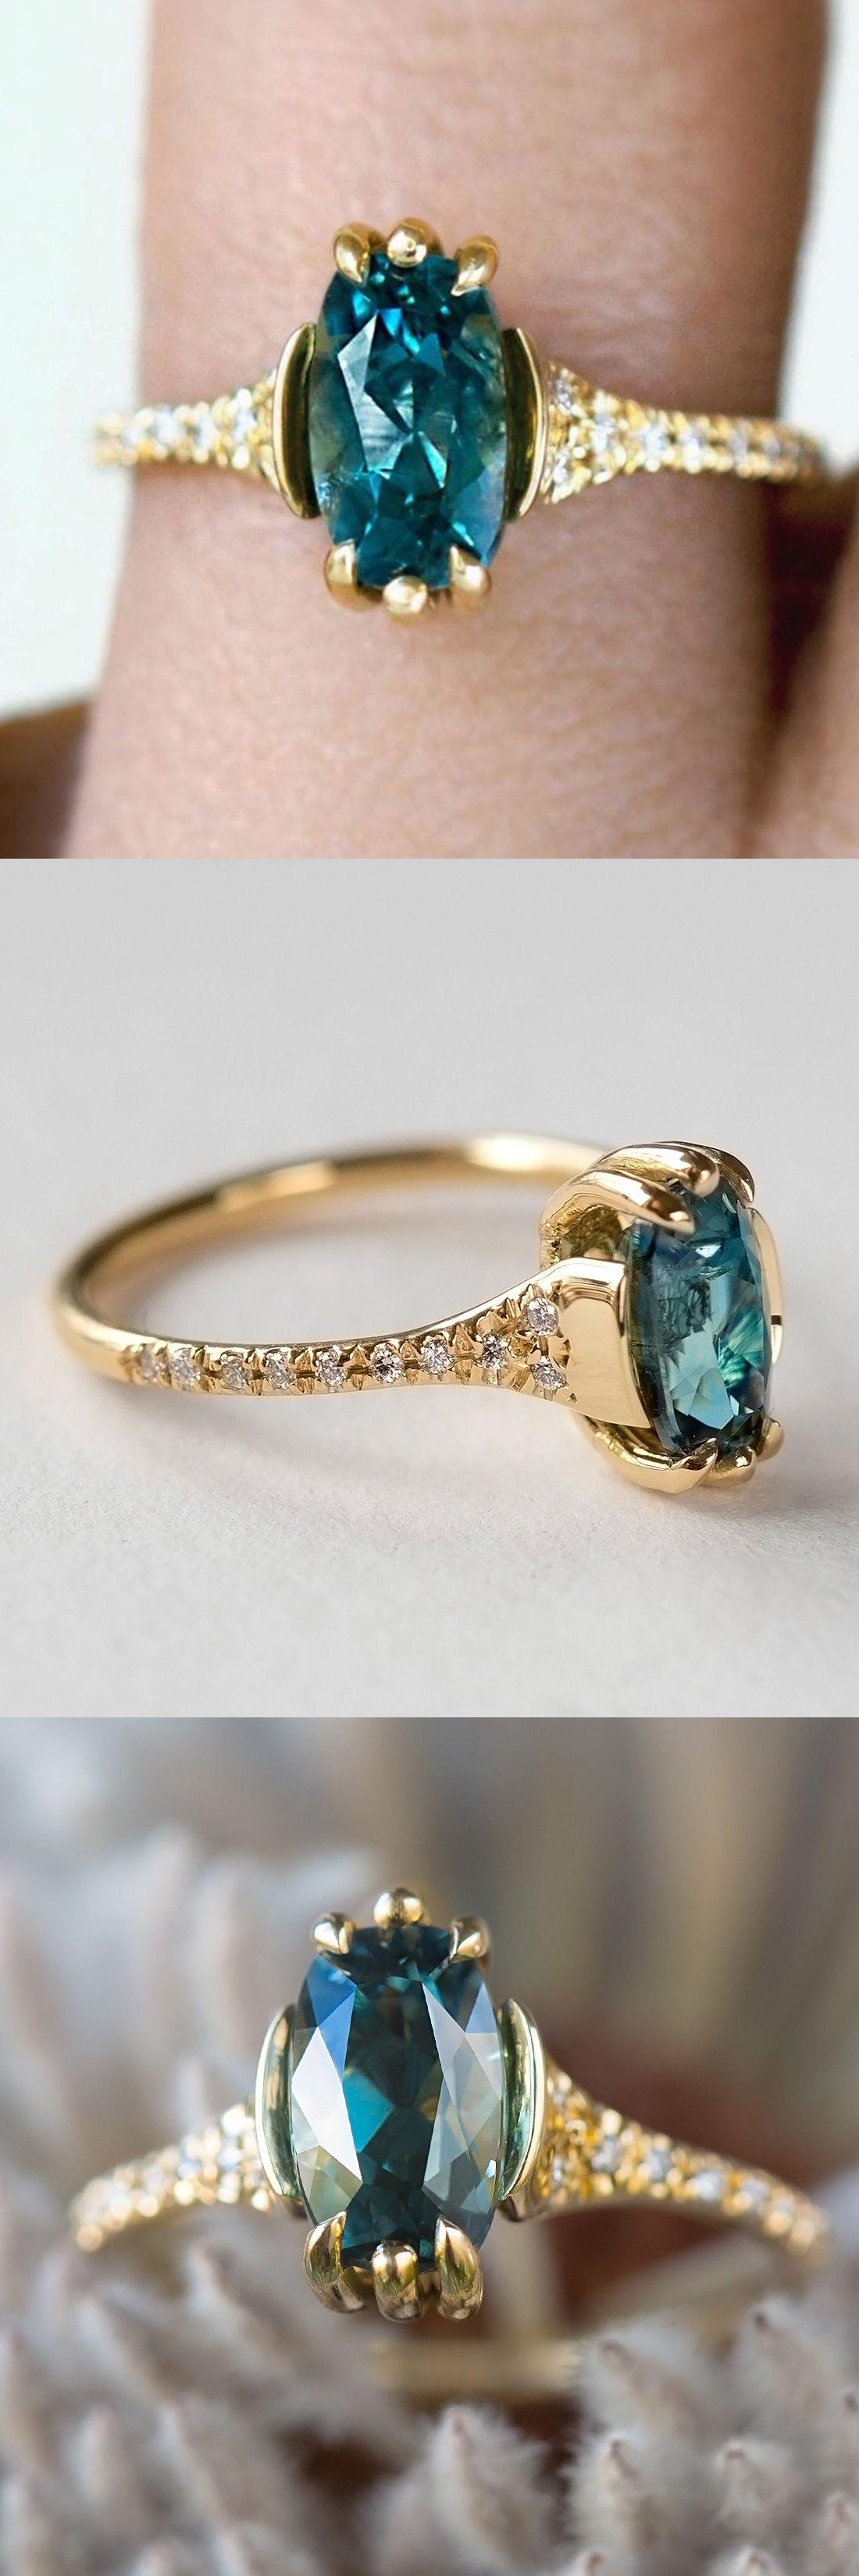 Teal Montana Sapphire Cushion Pavlova Ring Engagement